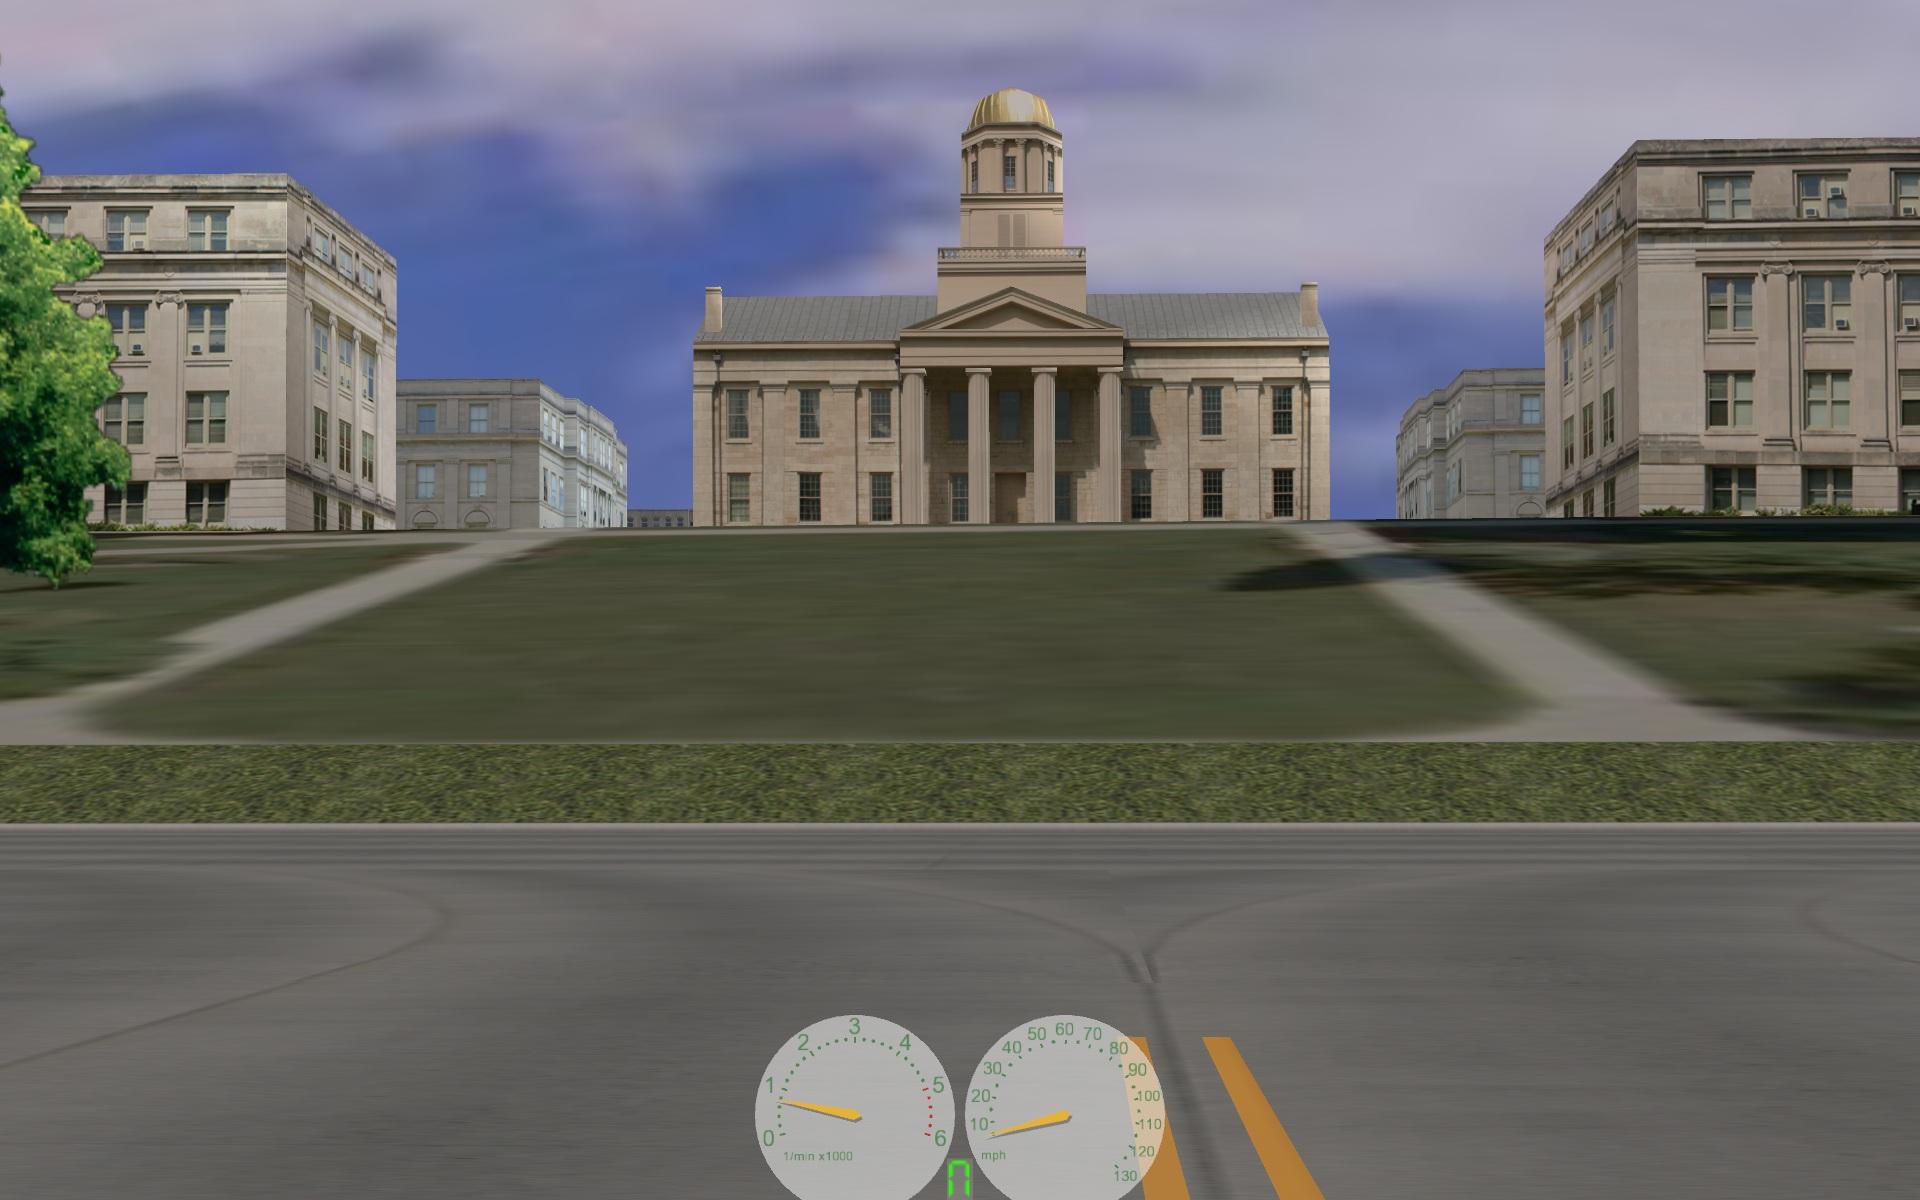 Old Driving Simulator Vic